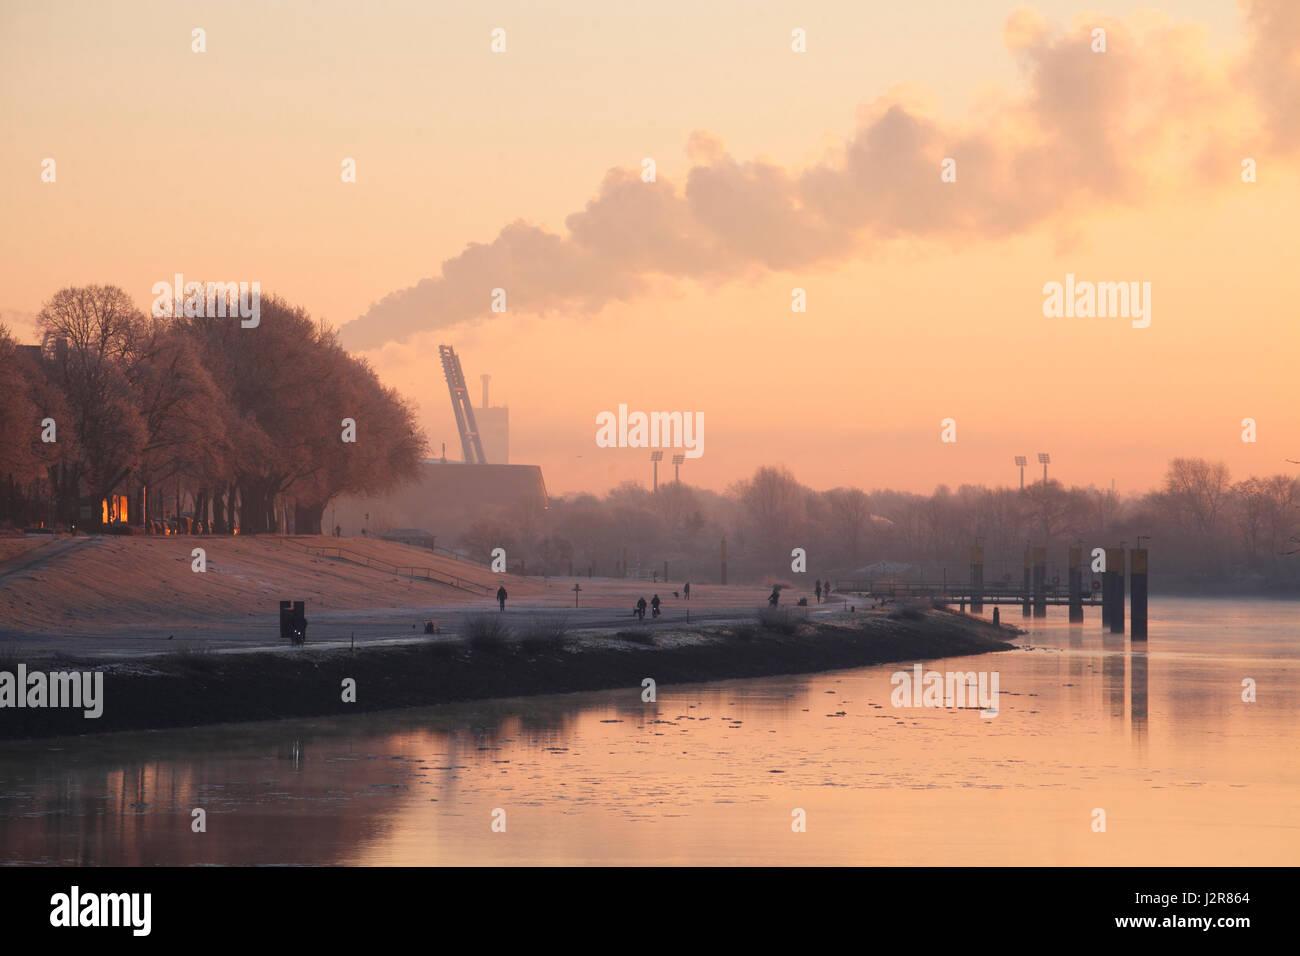 River Weser in WinterTower at Morning, Bremen, Germany  I Weserufer in der Morgedämmerung mit Raureif , Bremen, - Stock Image